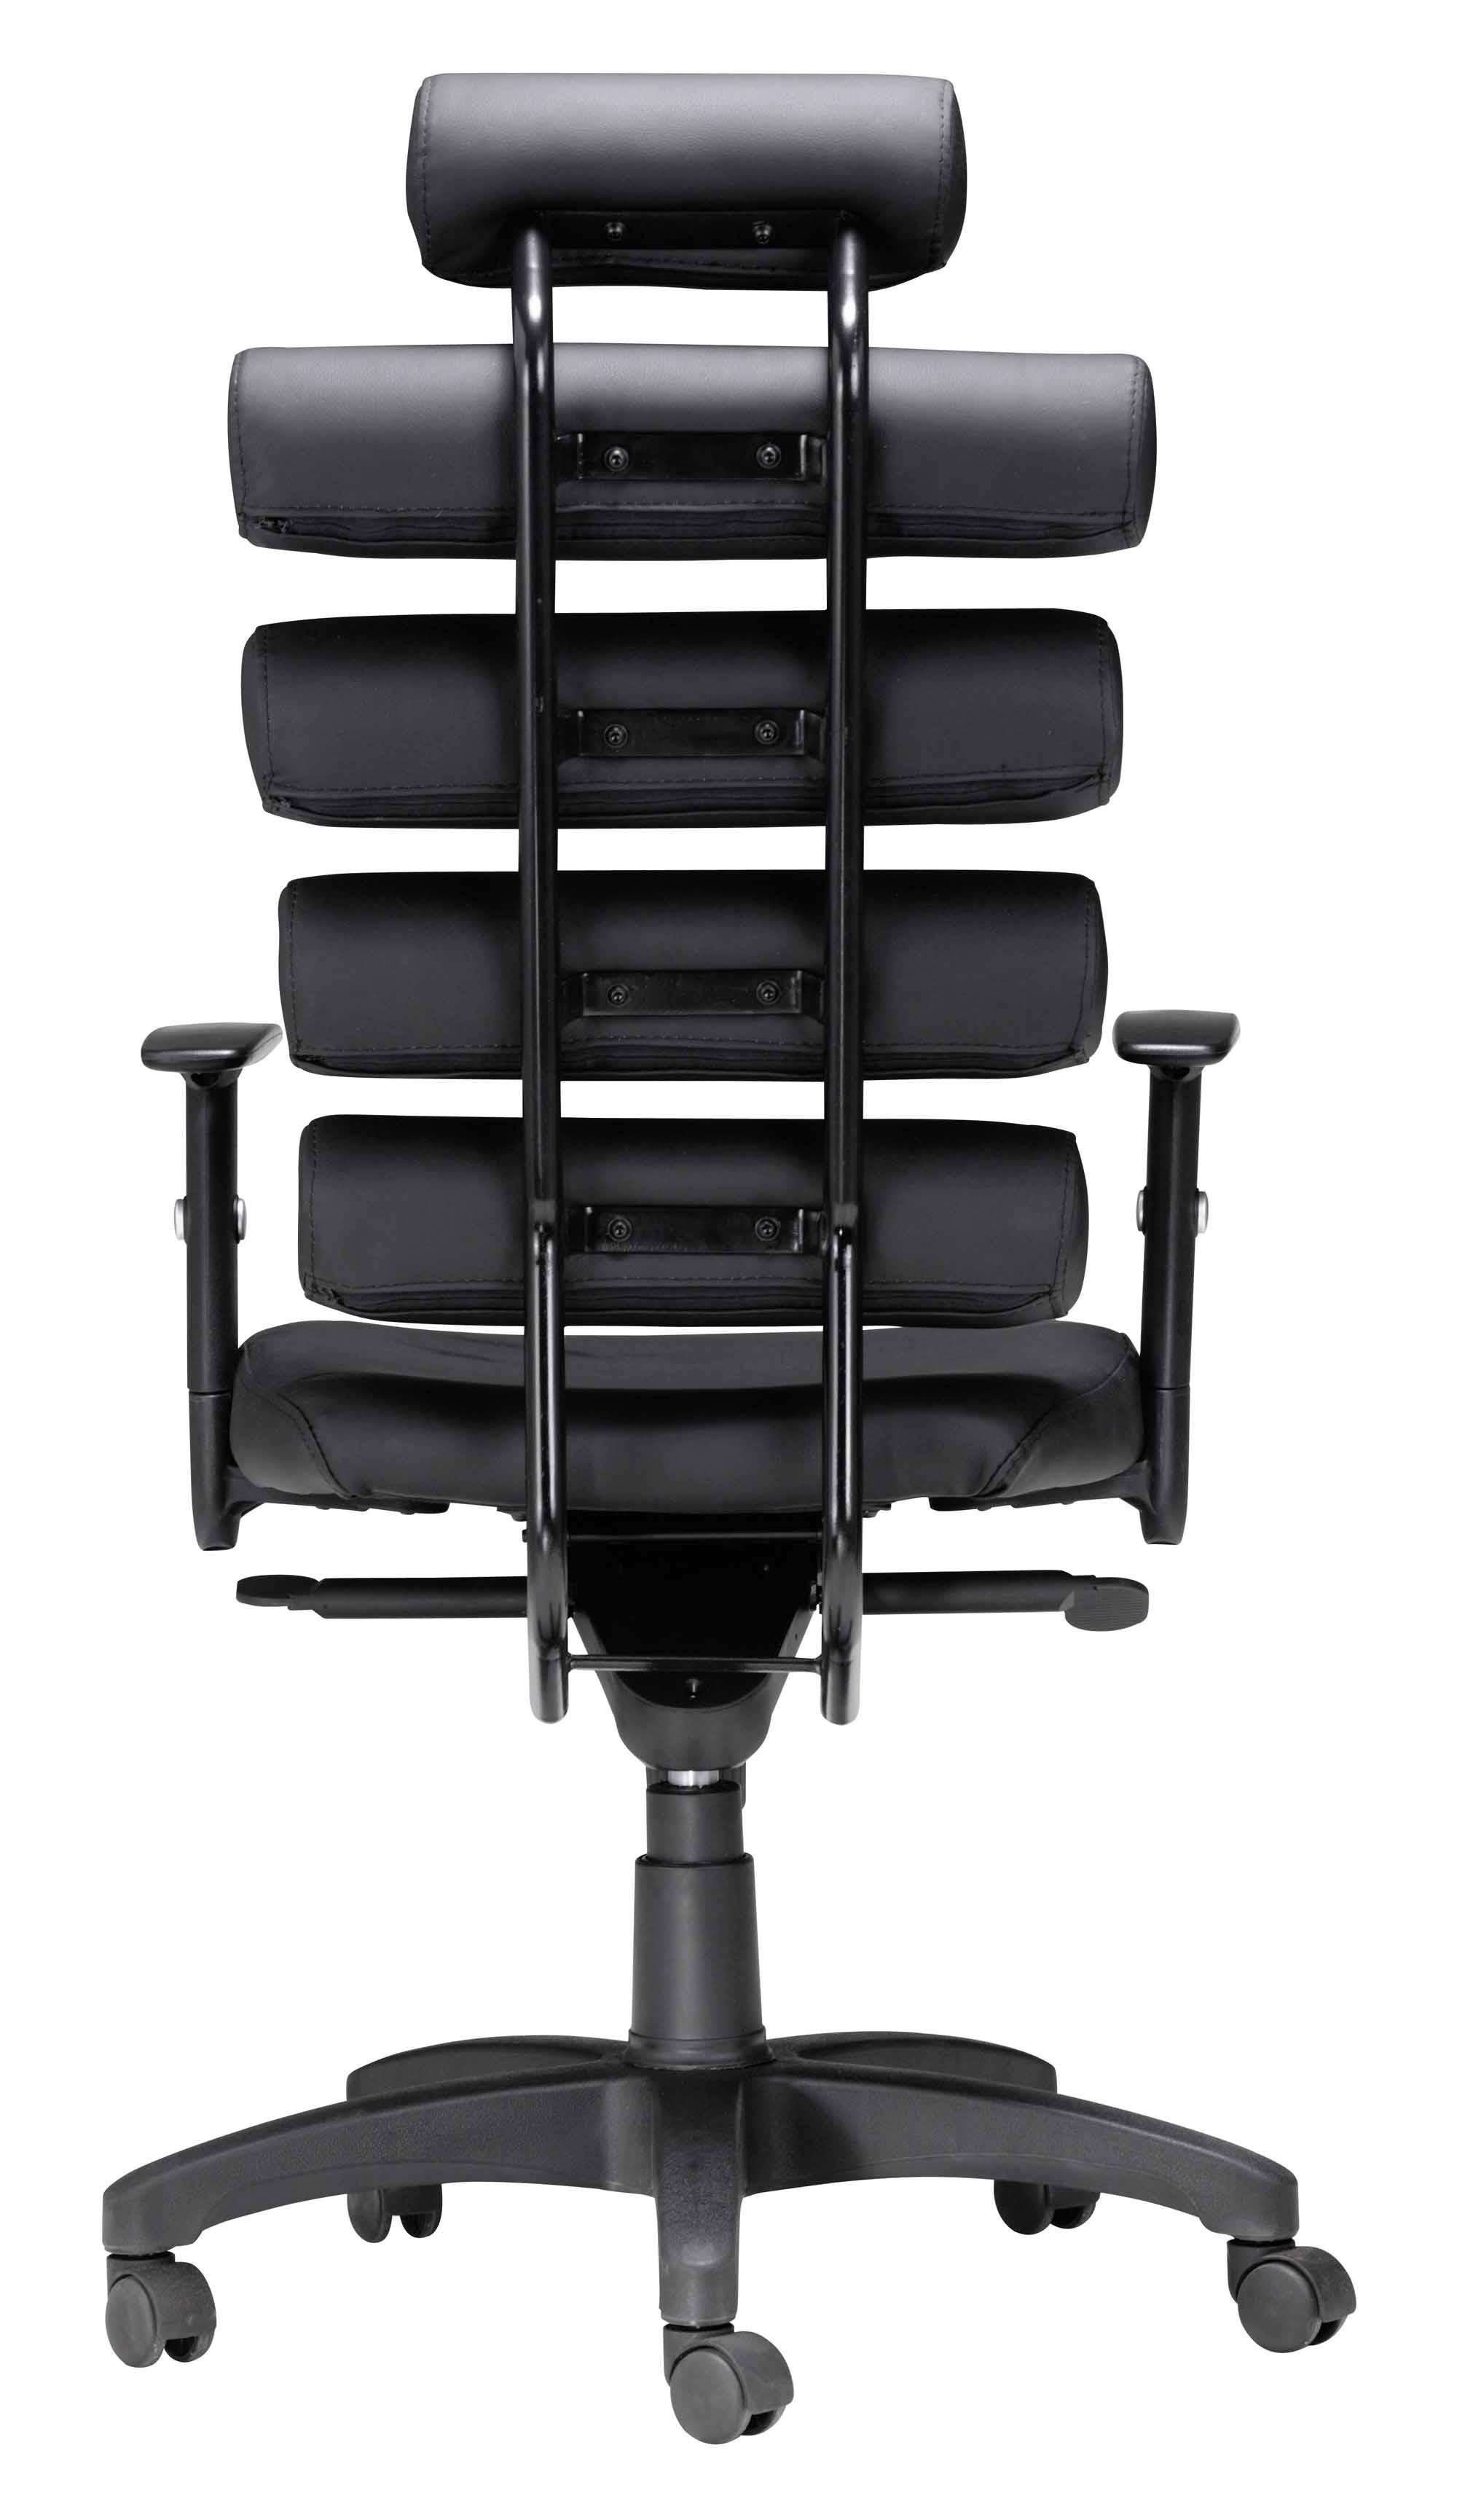 unico office chair. Unico Office Chair. Chair C 6